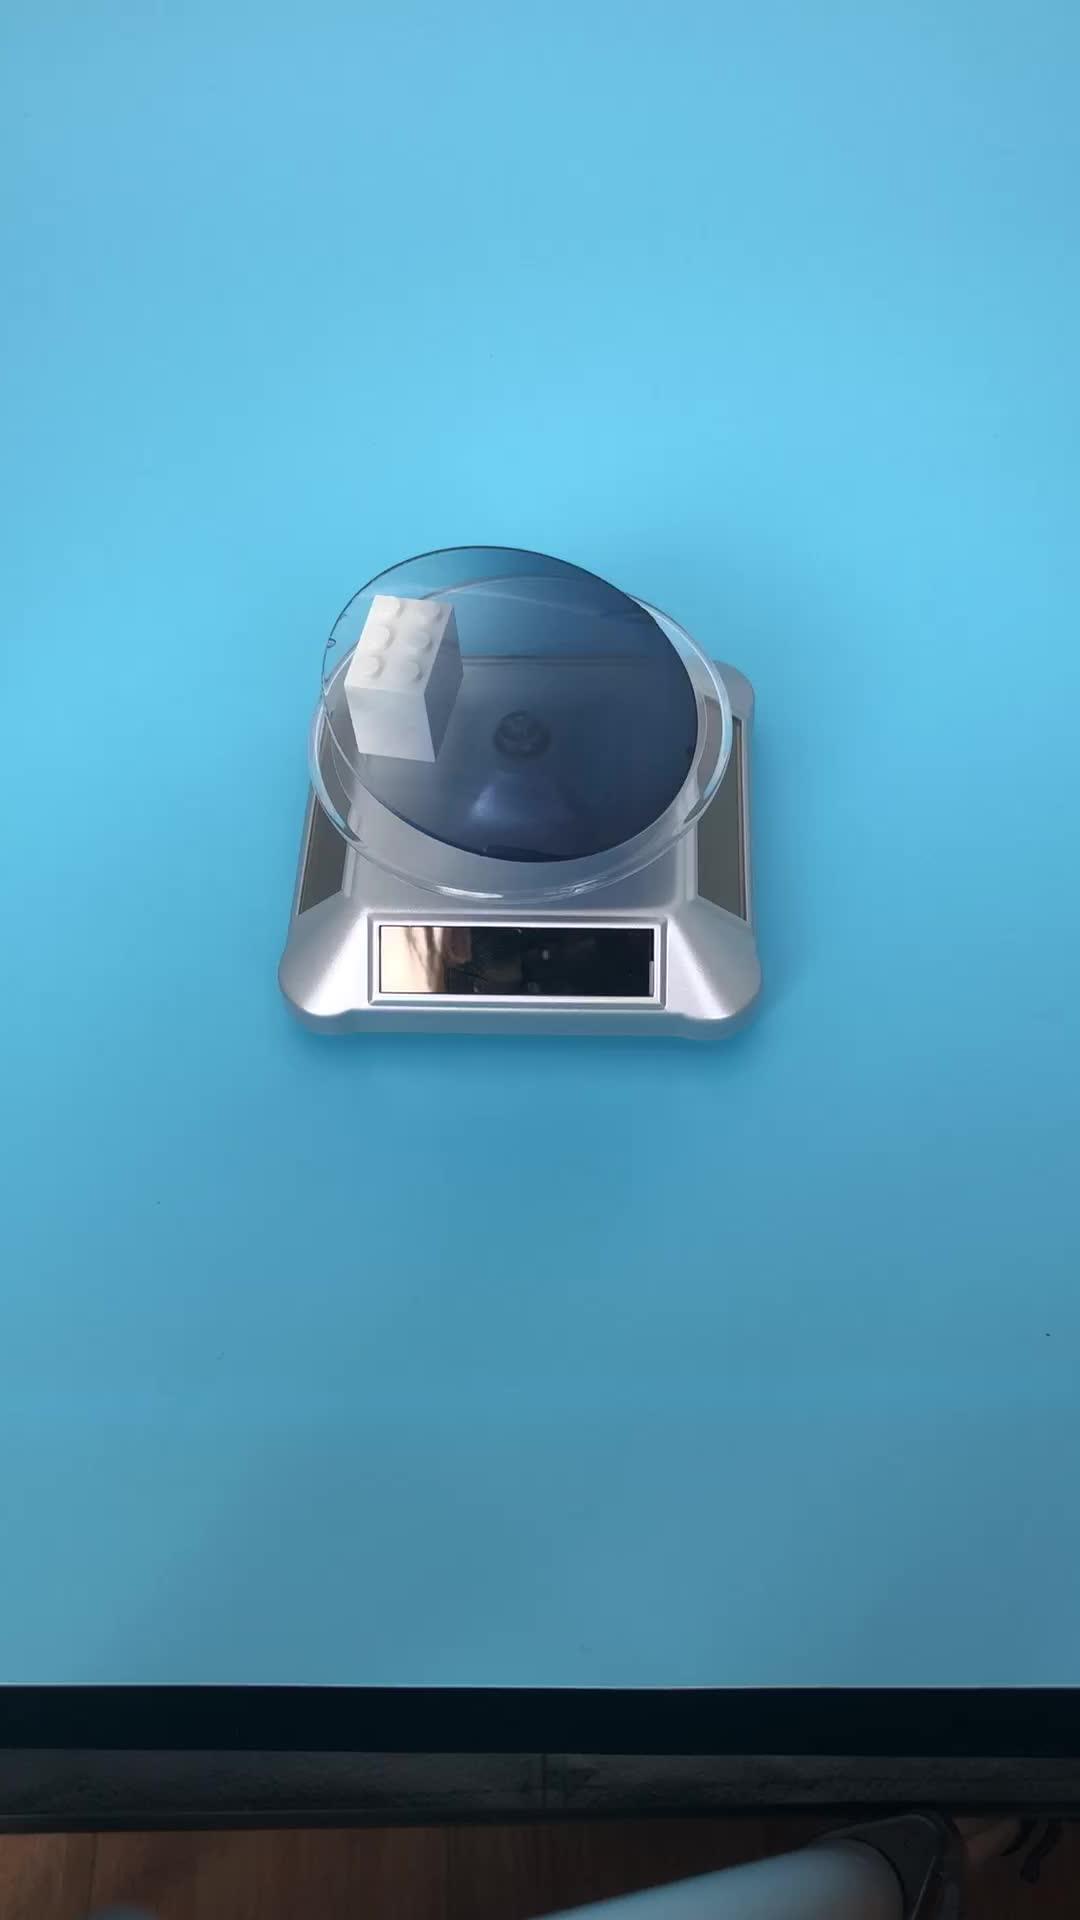 Anti-impact uv400 보 네이트 pc (gorilla glass lens 착 렌즈로 구성 대 한 선글라스